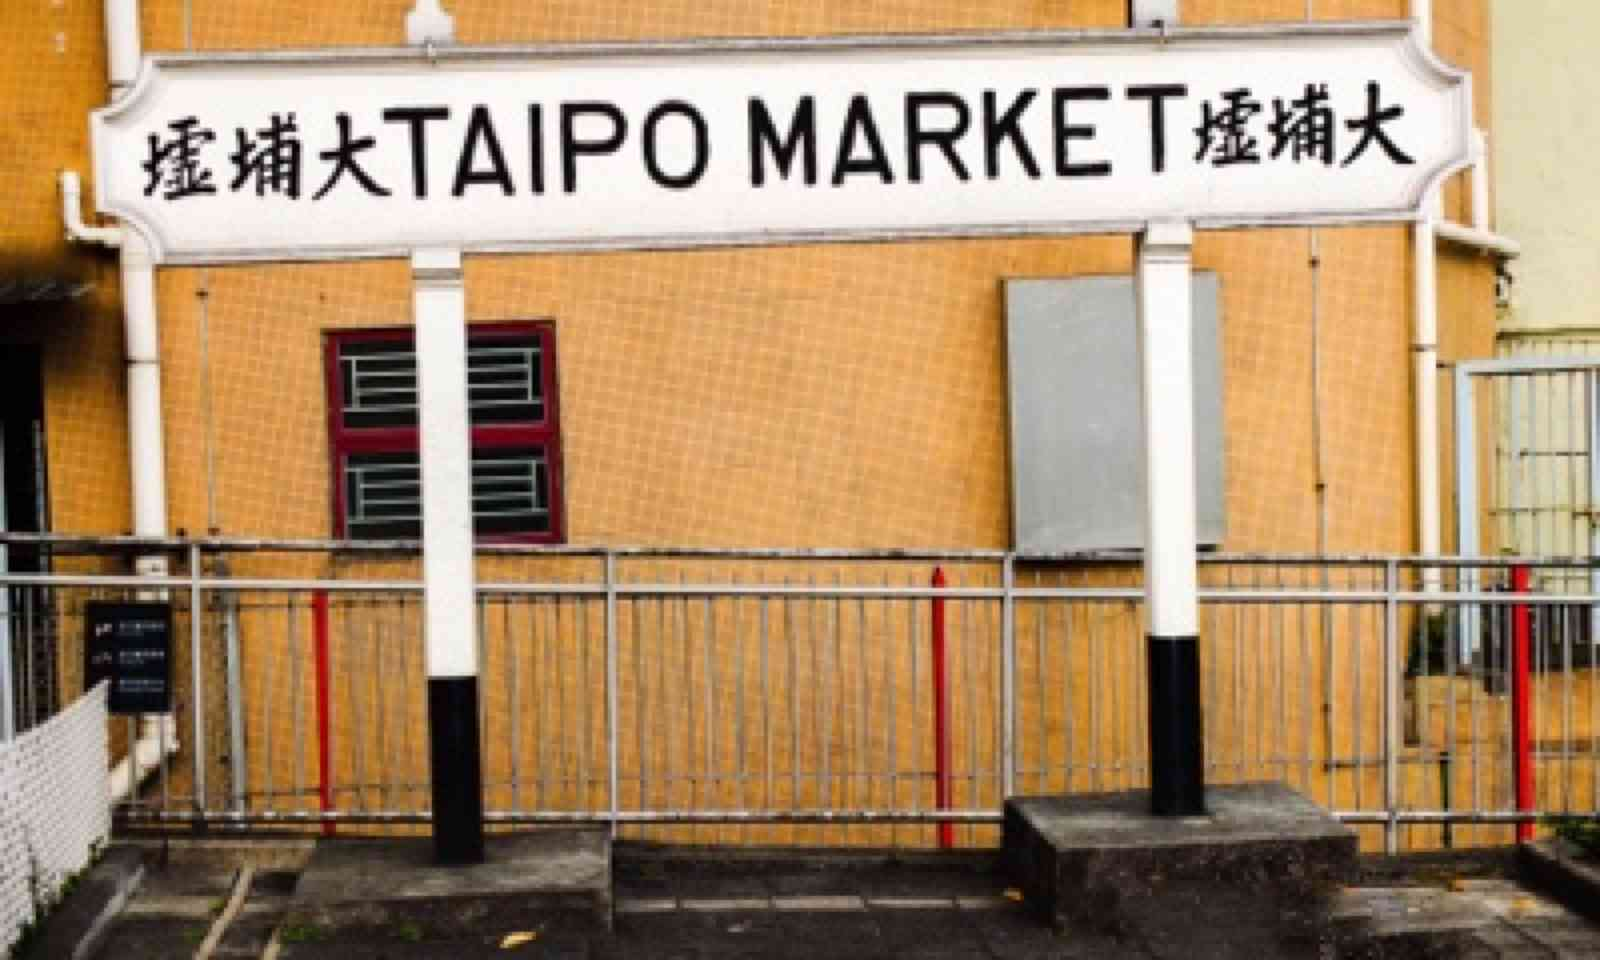 Taipo Market station (Matthew Woodward)